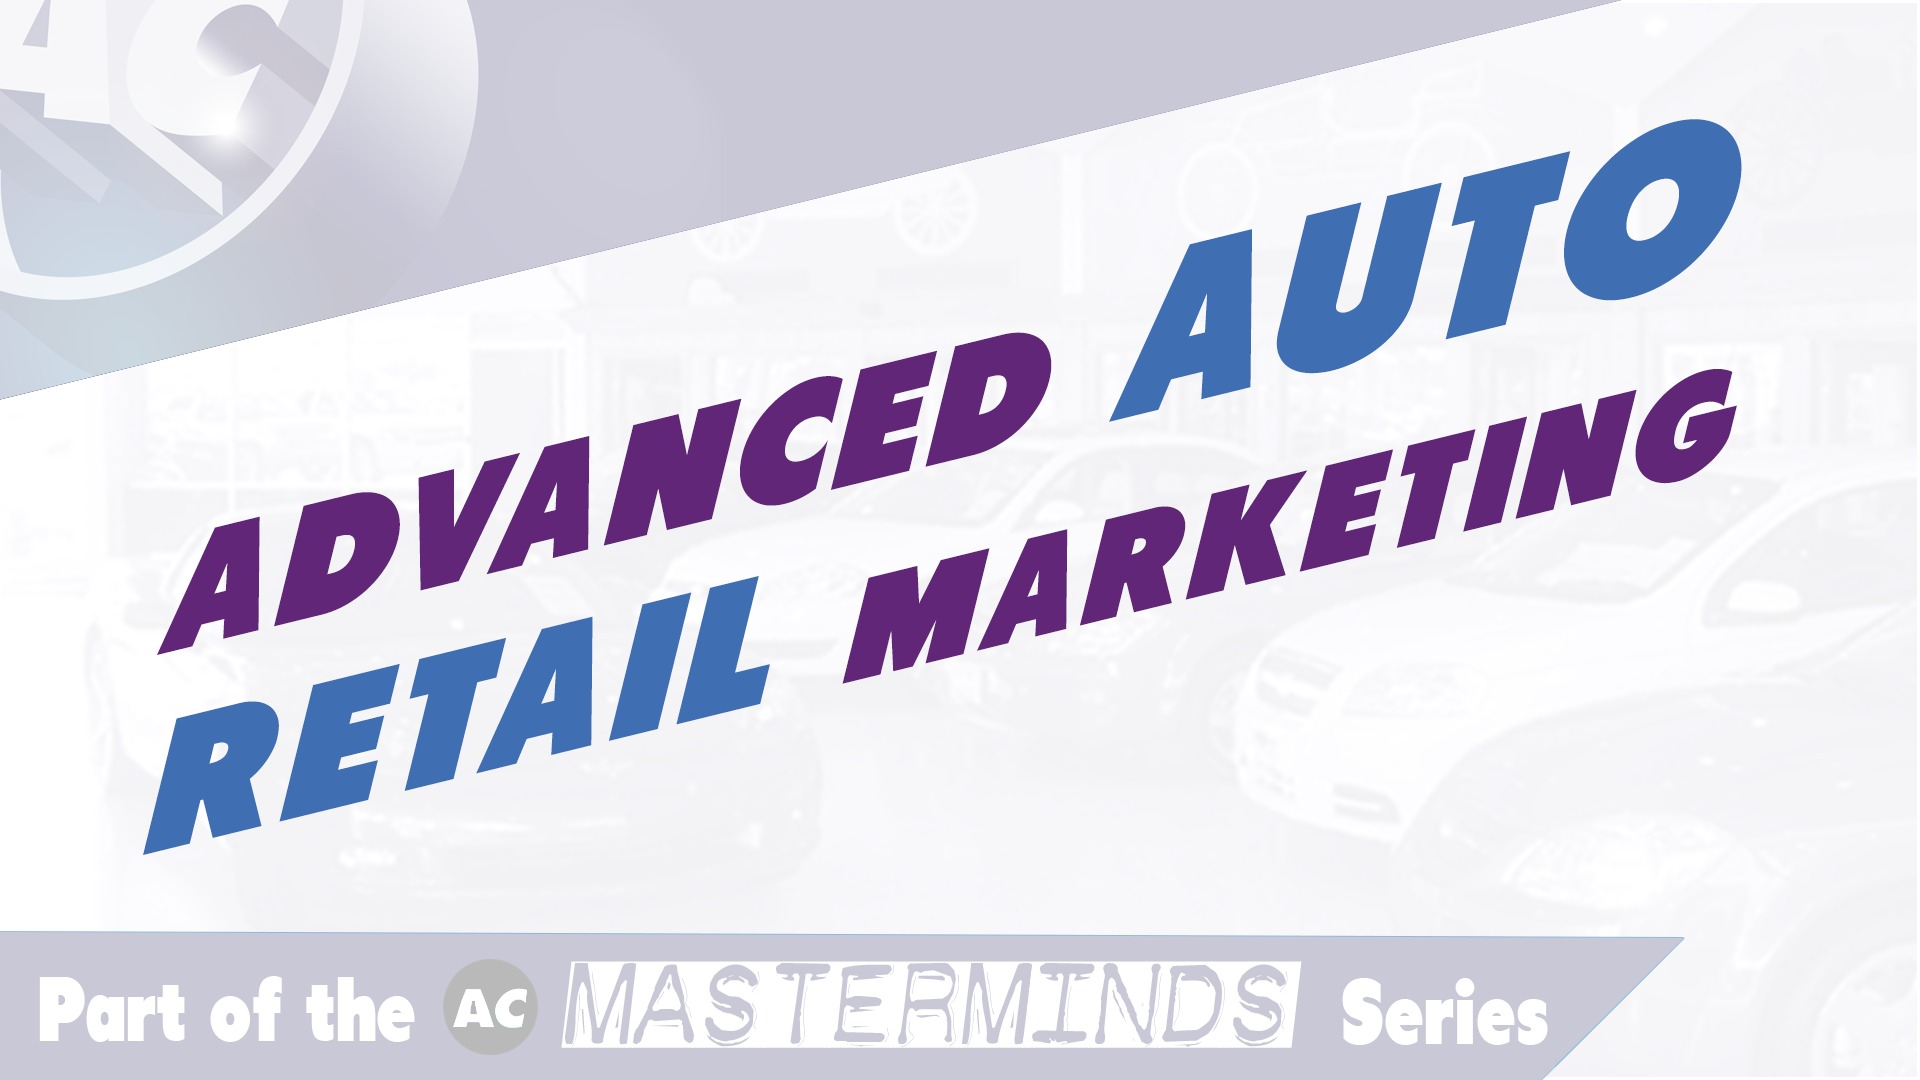 Advanced Auto Retail Marketing